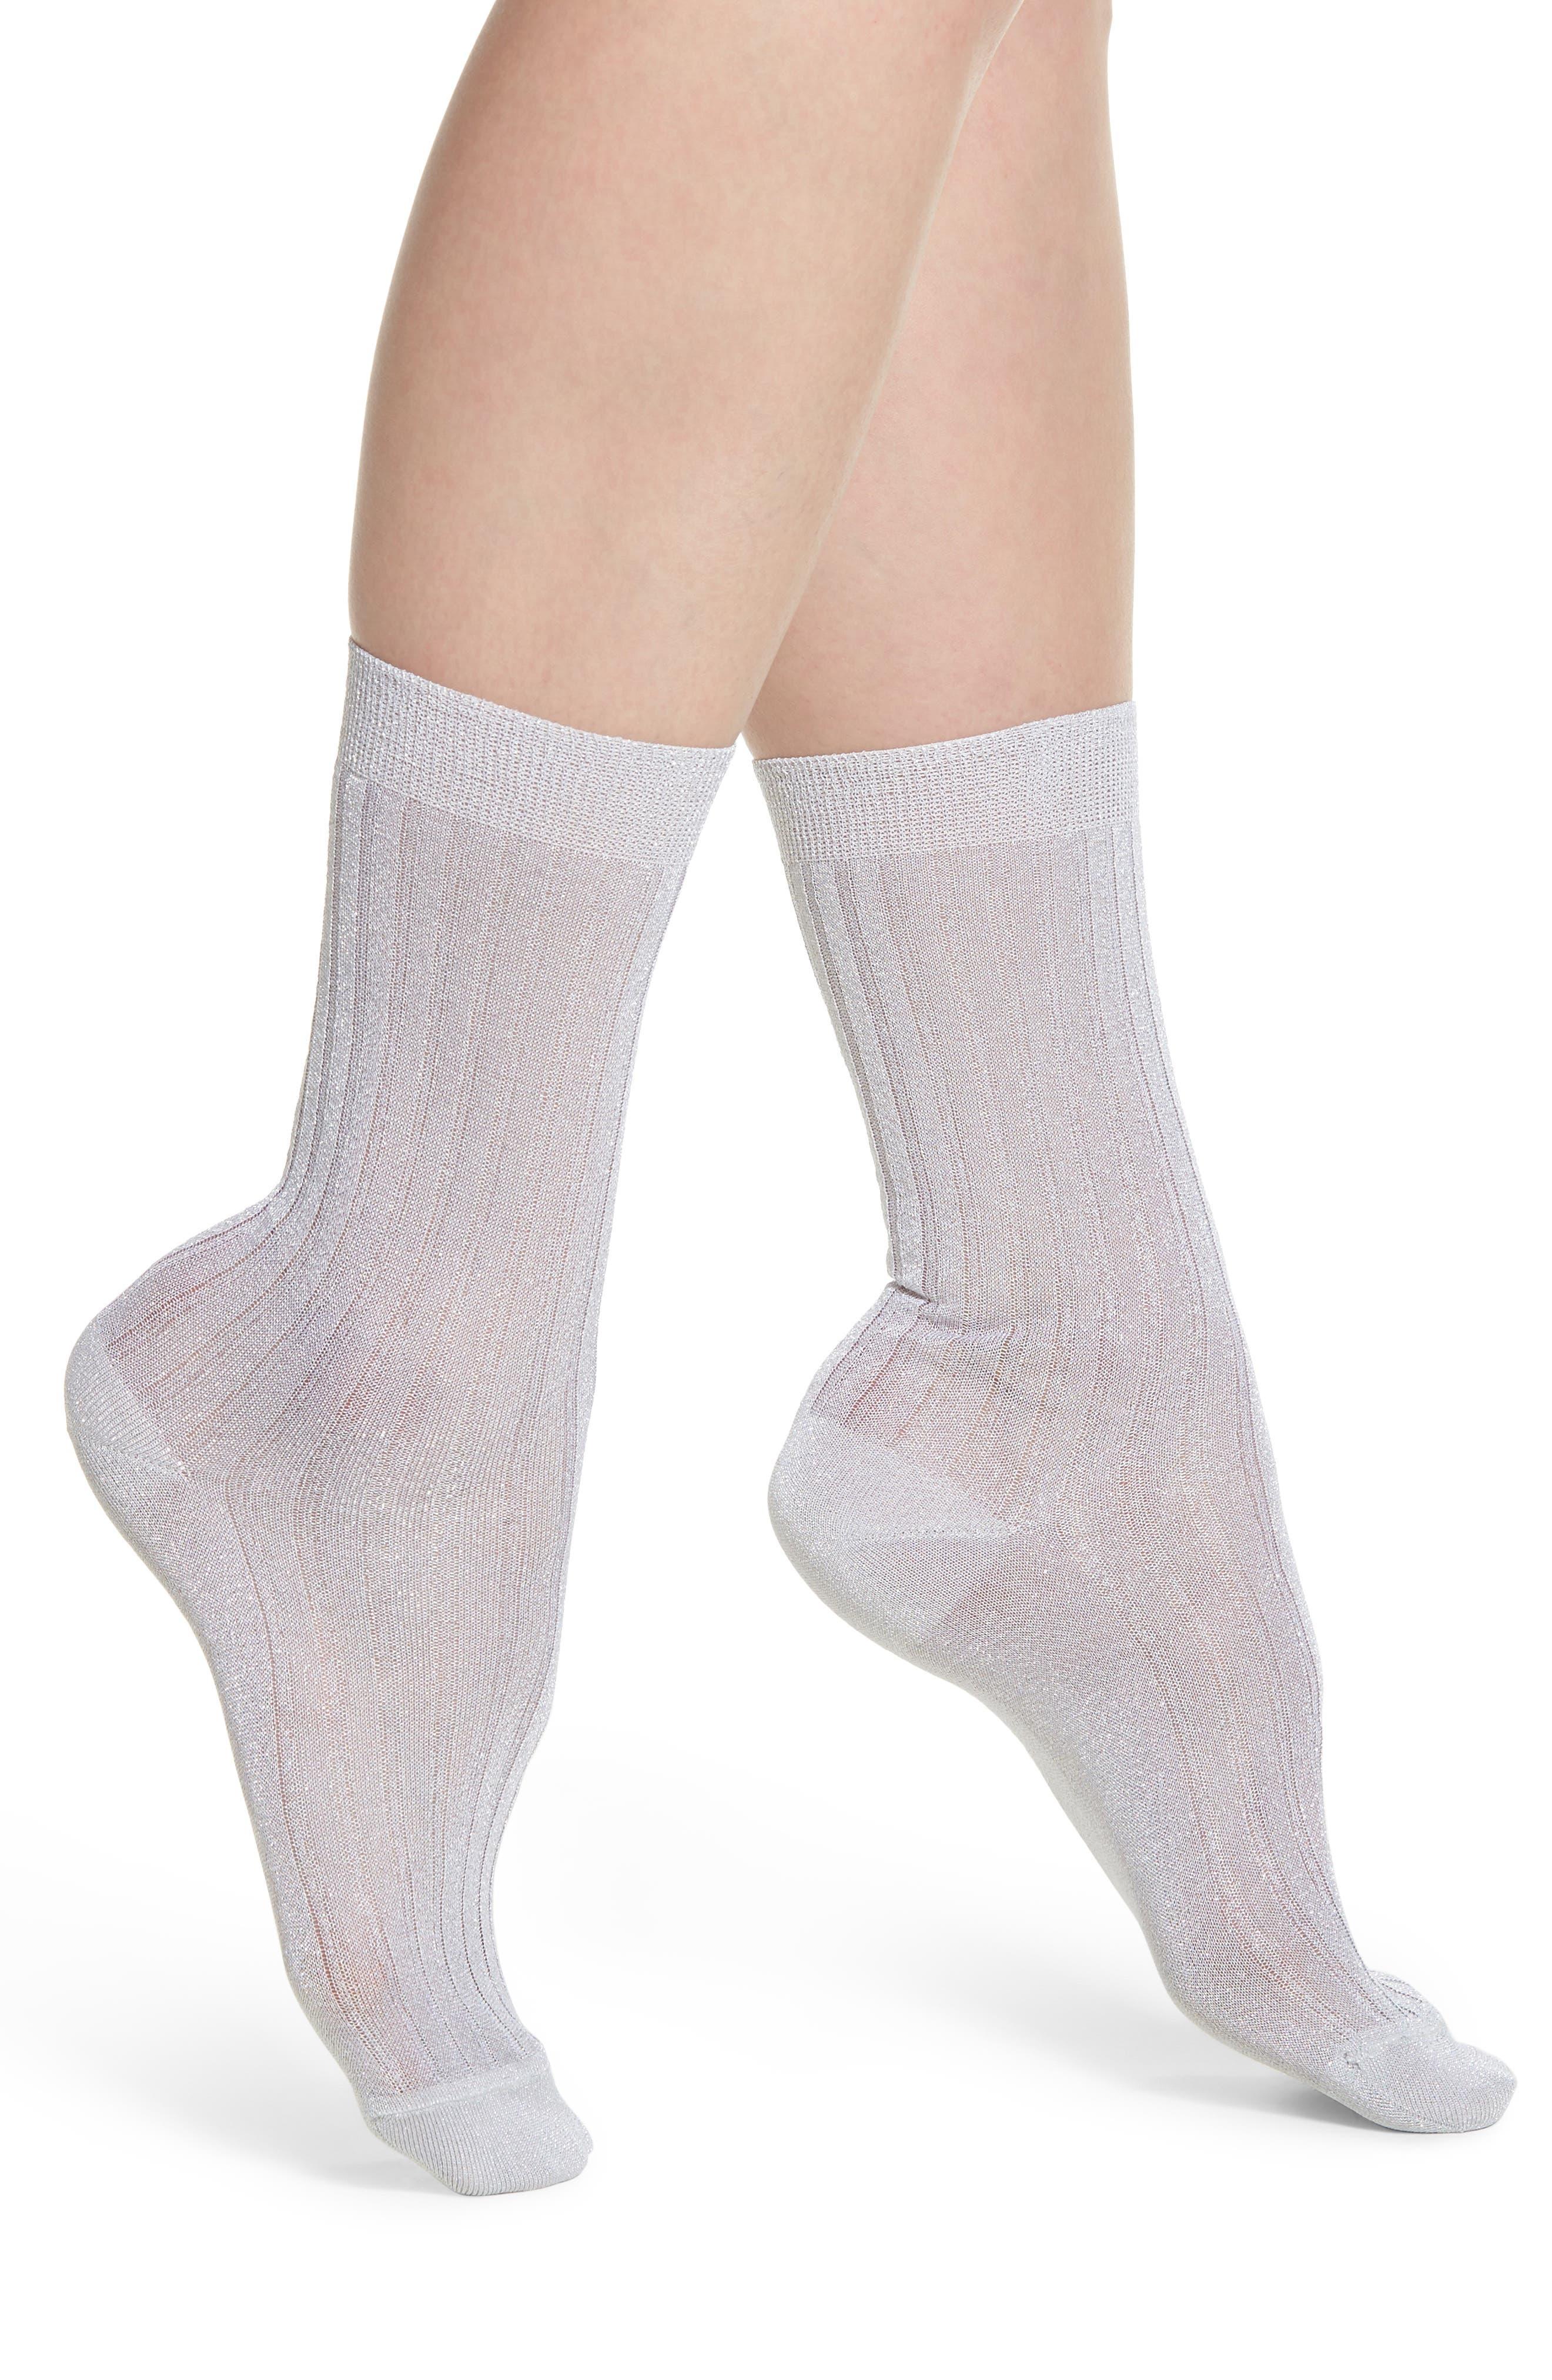 Costina Metallic Ankle Socks,                             Main thumbnail 1, color,                             040